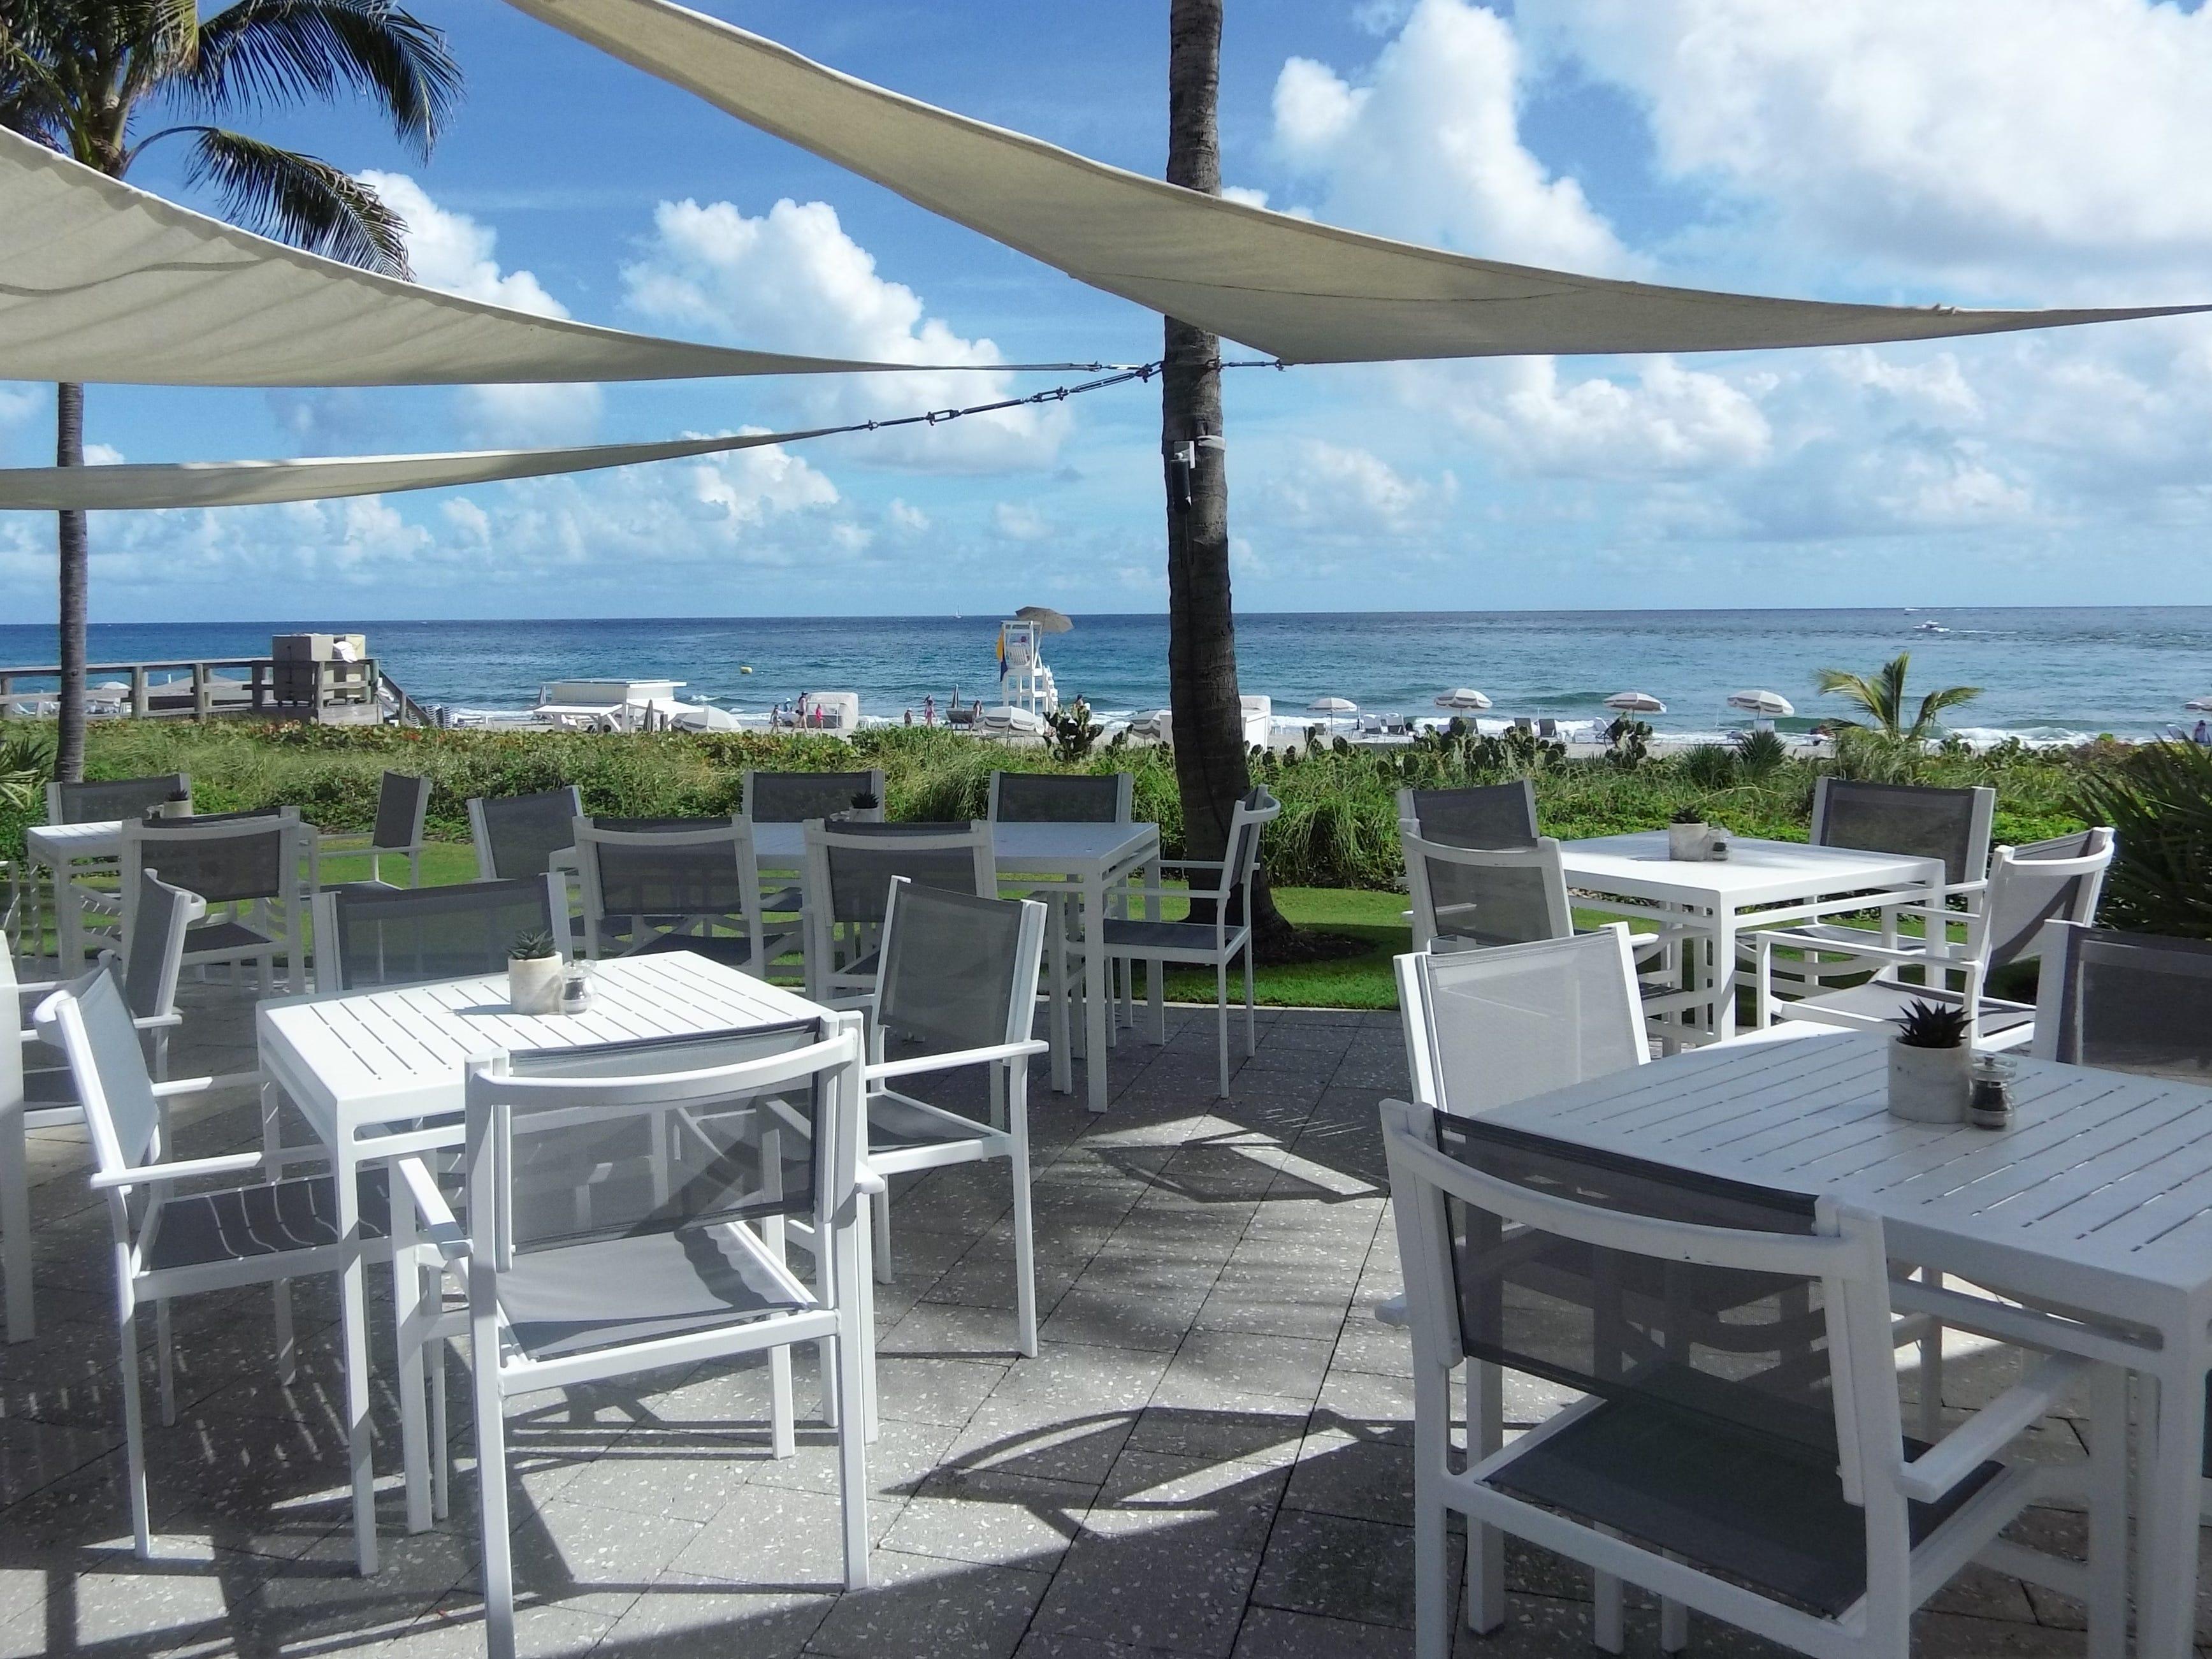 Views of the Atlantic Ocean from Beaches Restaurant and Bar at Boca Beach Club.